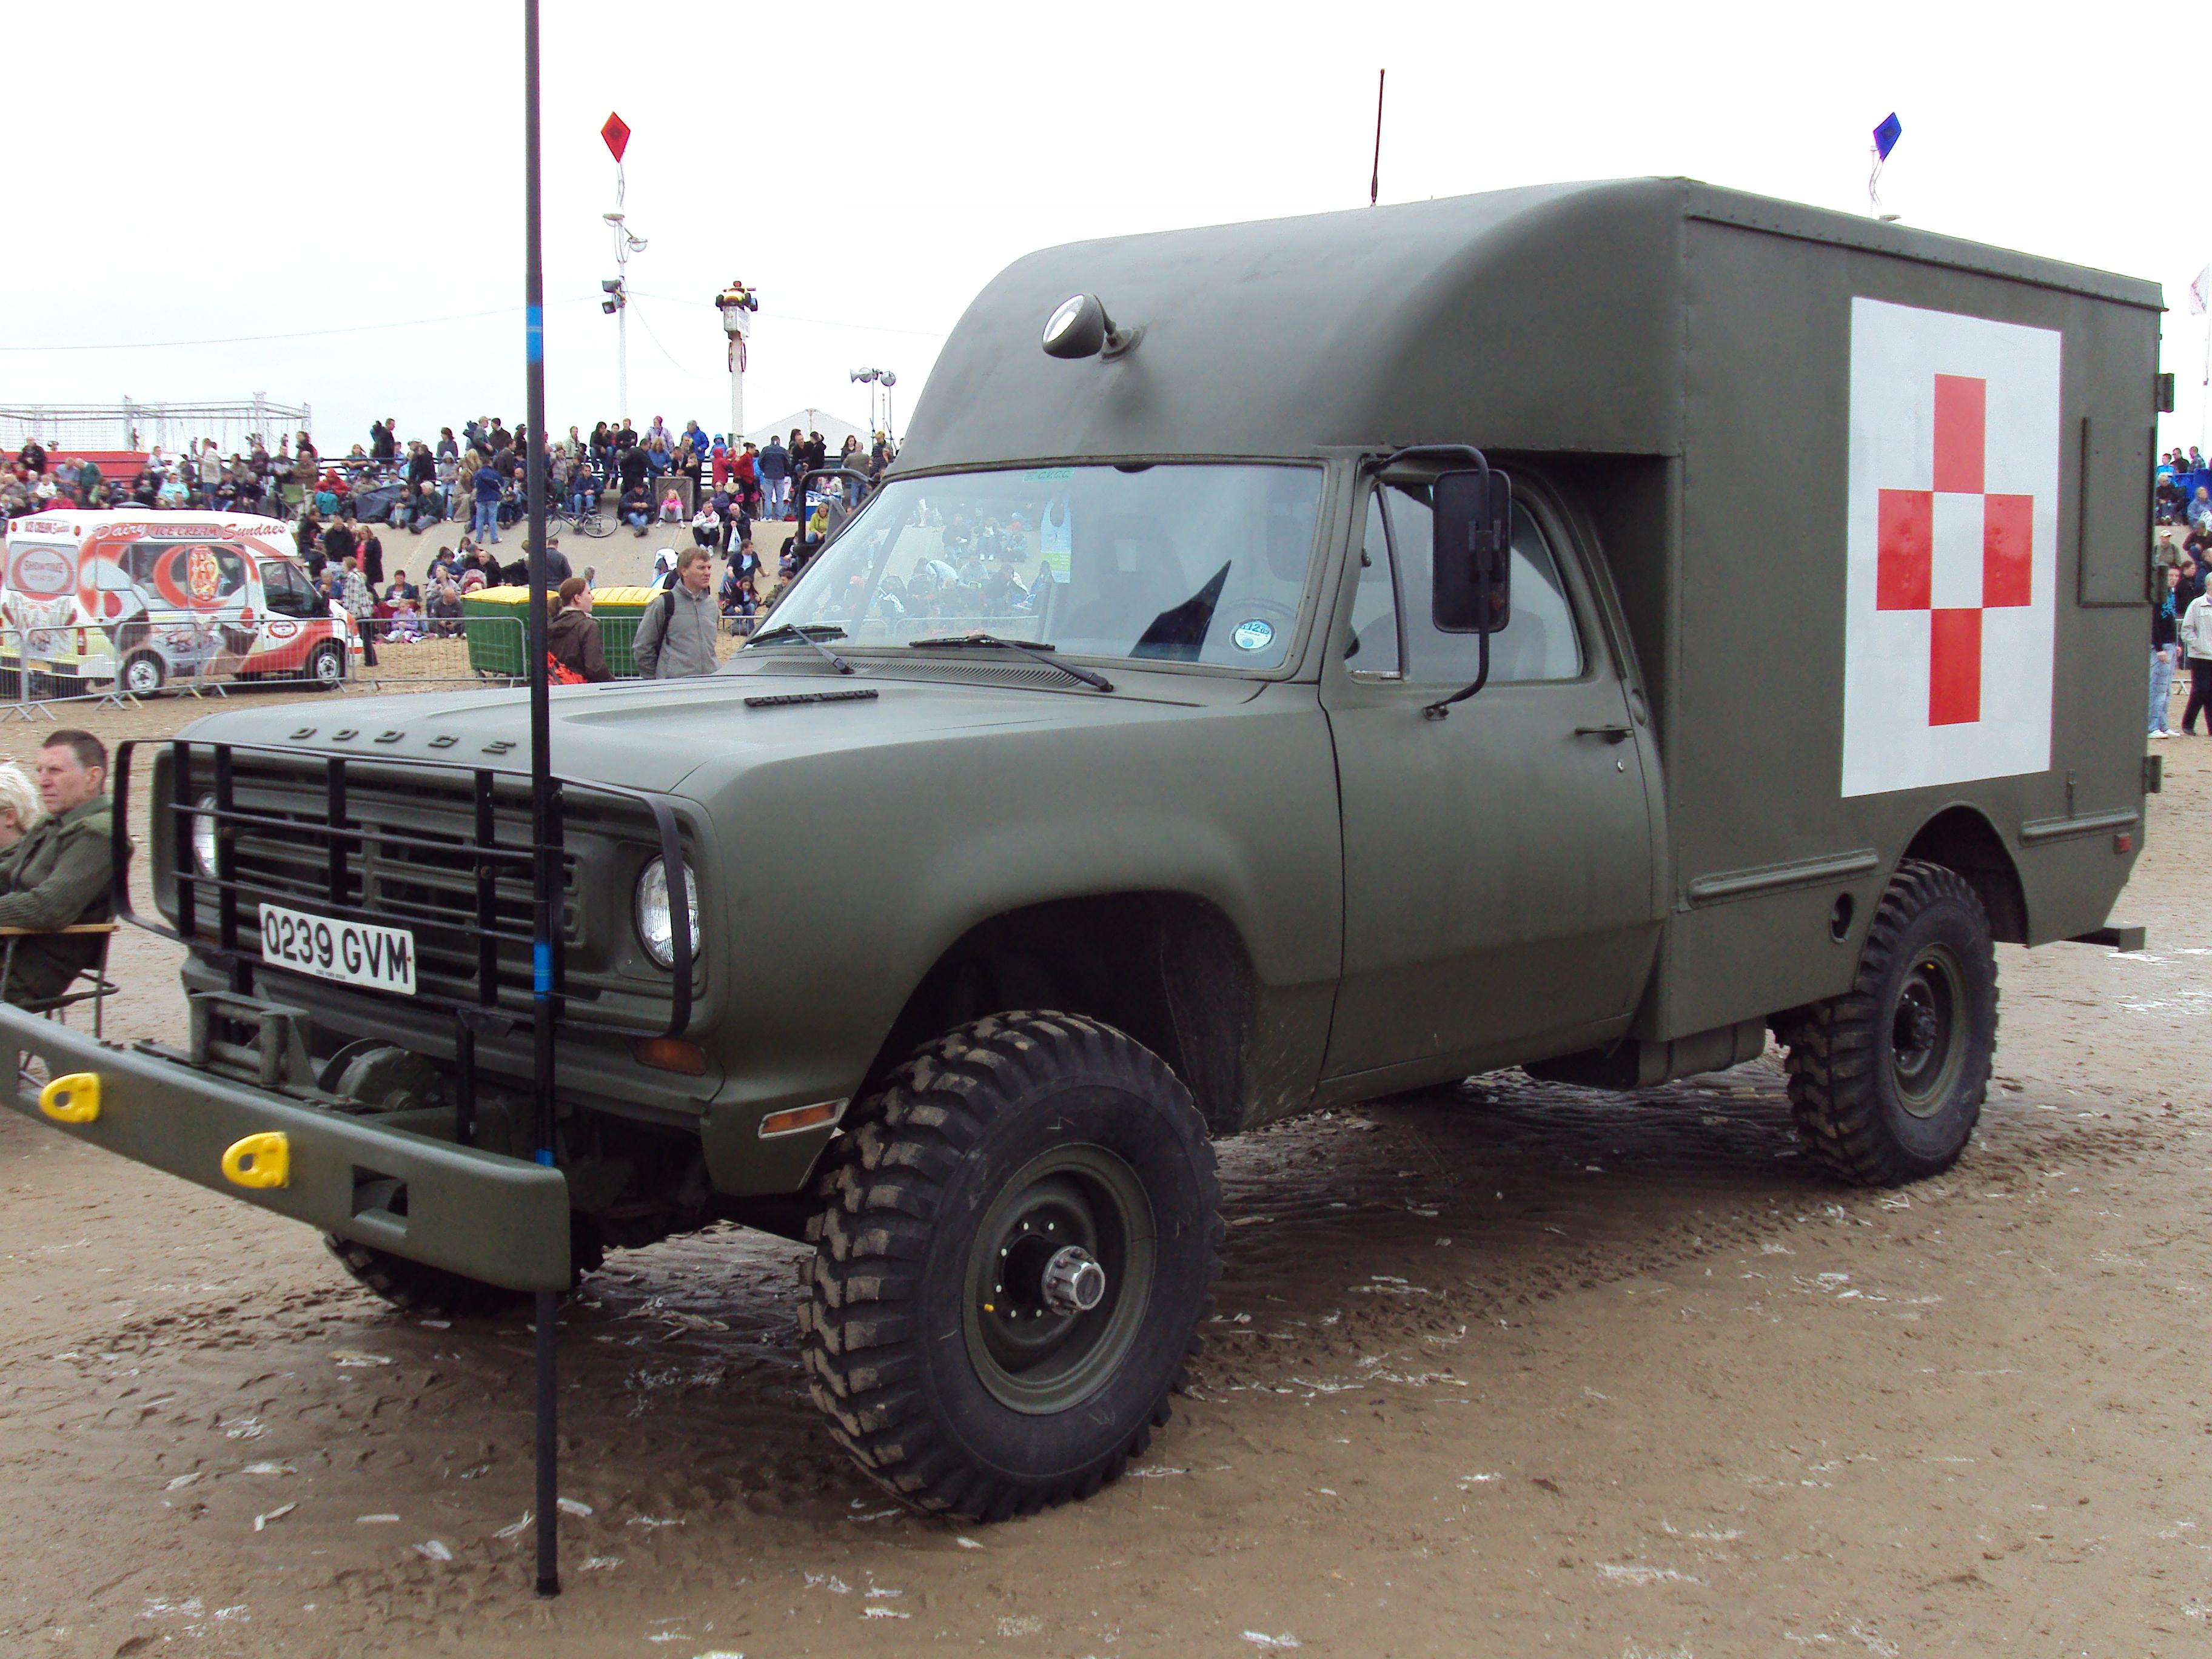 63 Power Wagon >> File:Dodge military ambulance, Southport.JPG - Wikimedia Commons